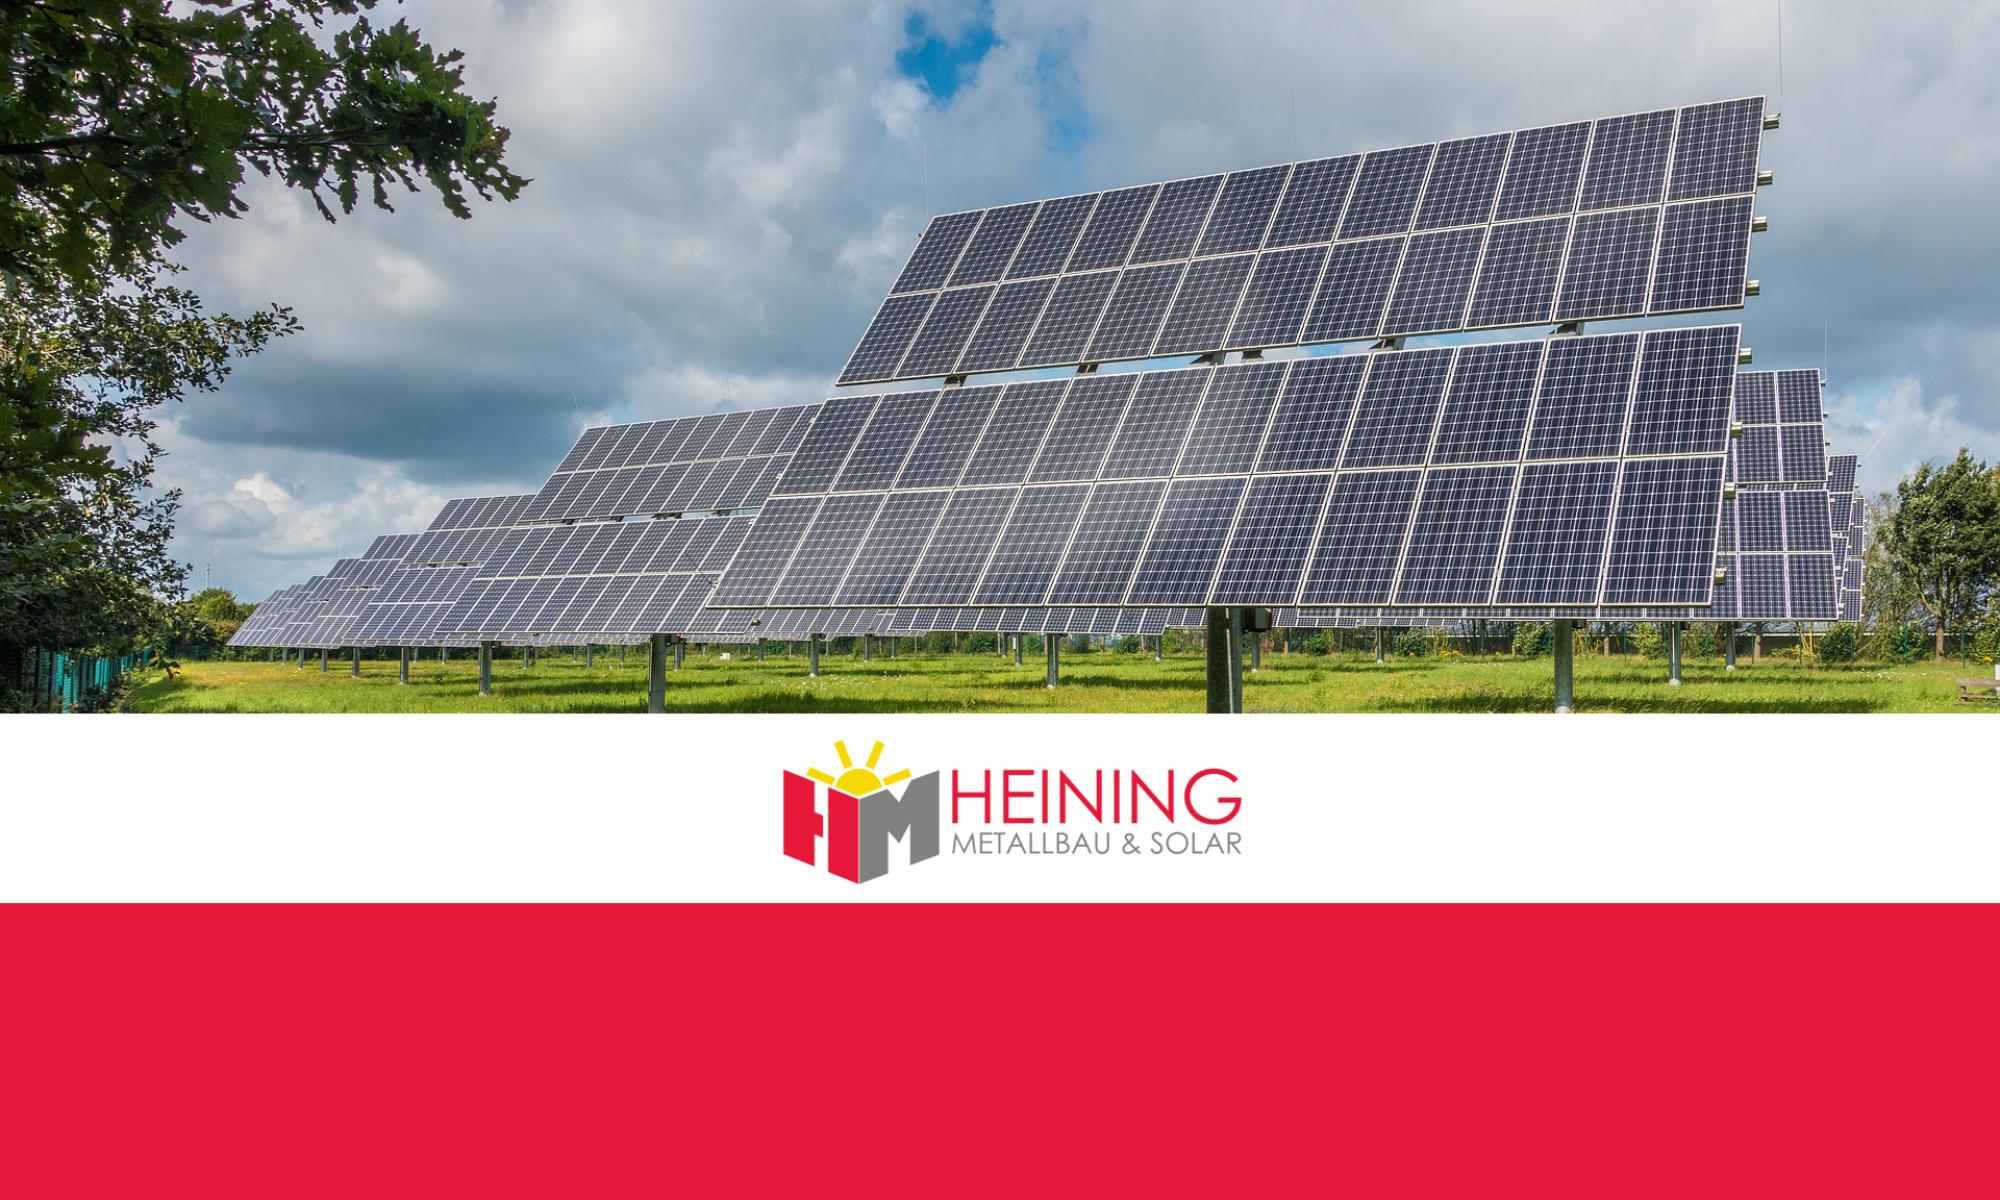 Heining | Metallbau & Solar Kemnath